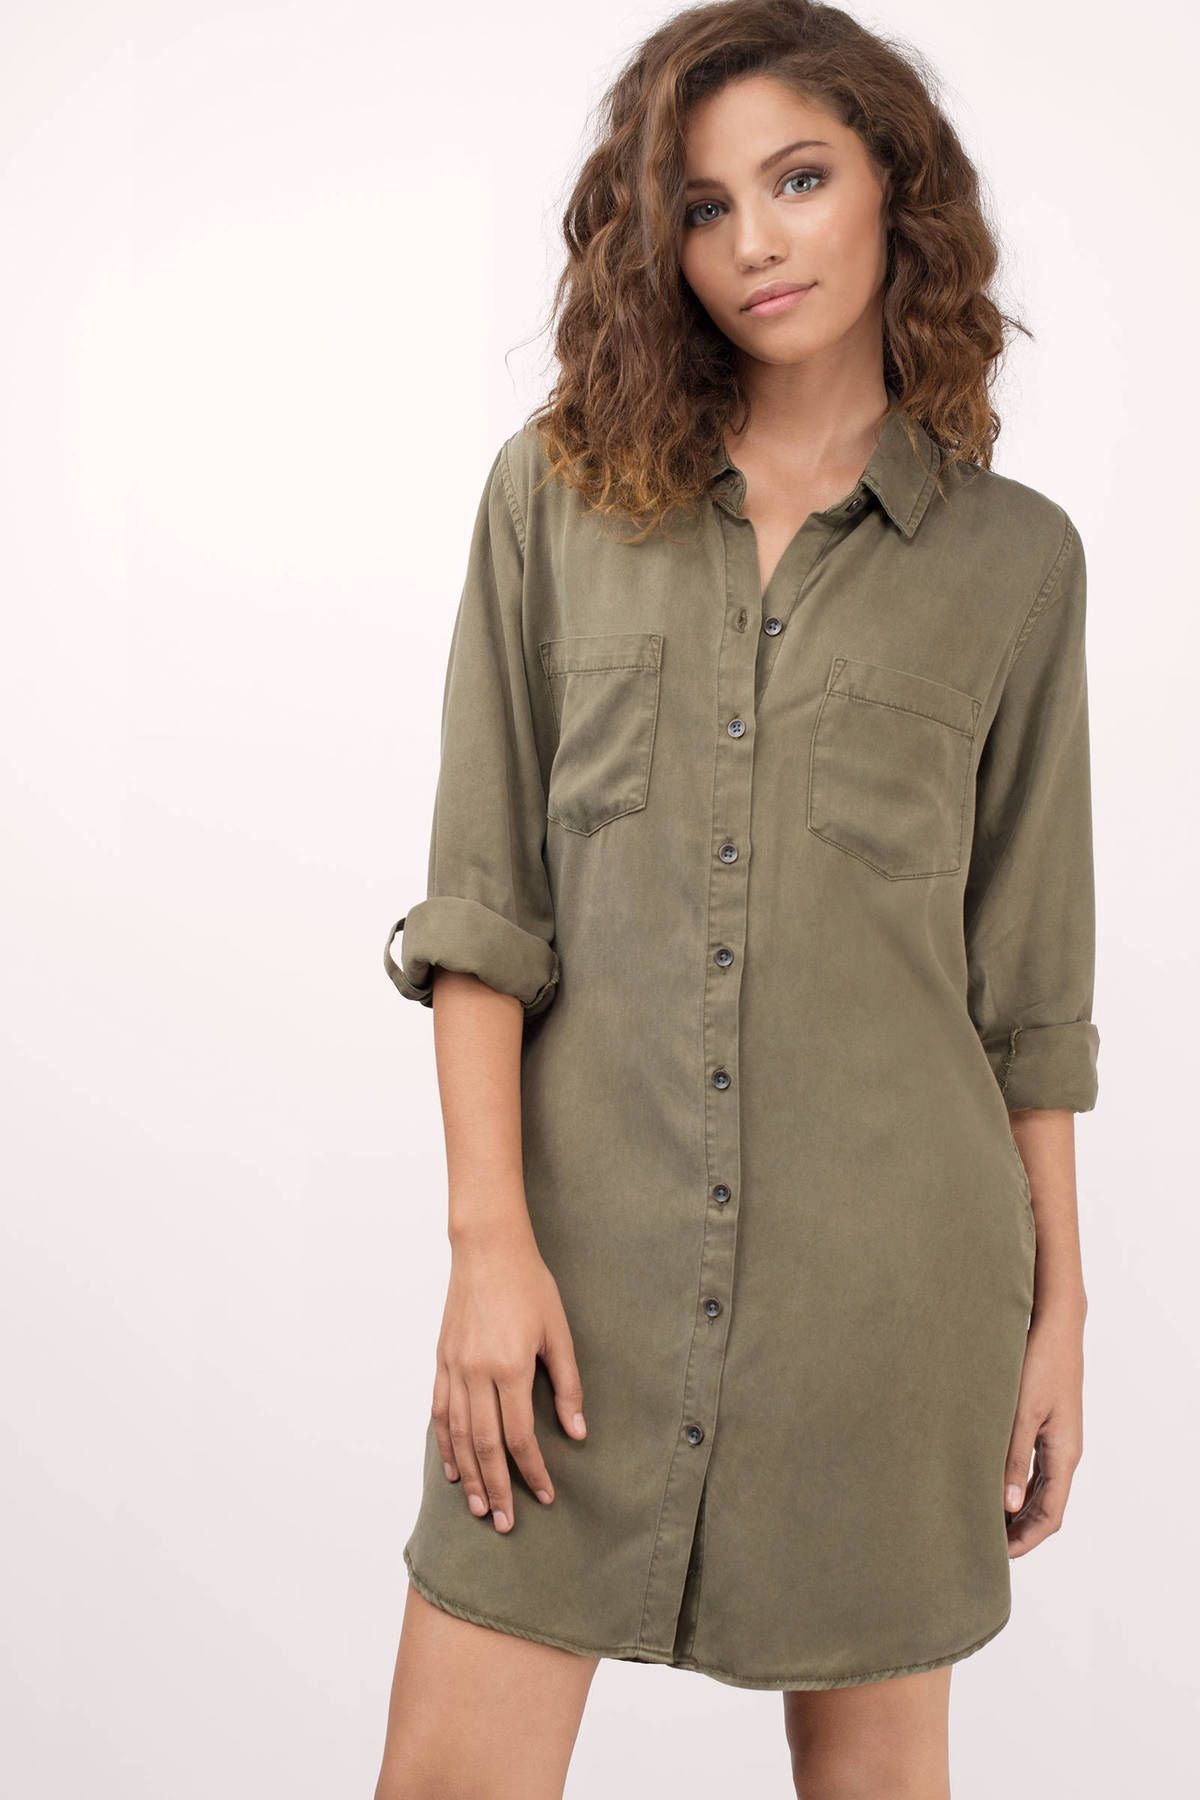 ... Supply Thread   Supply Better Days Olive Chambray Shirt Dress